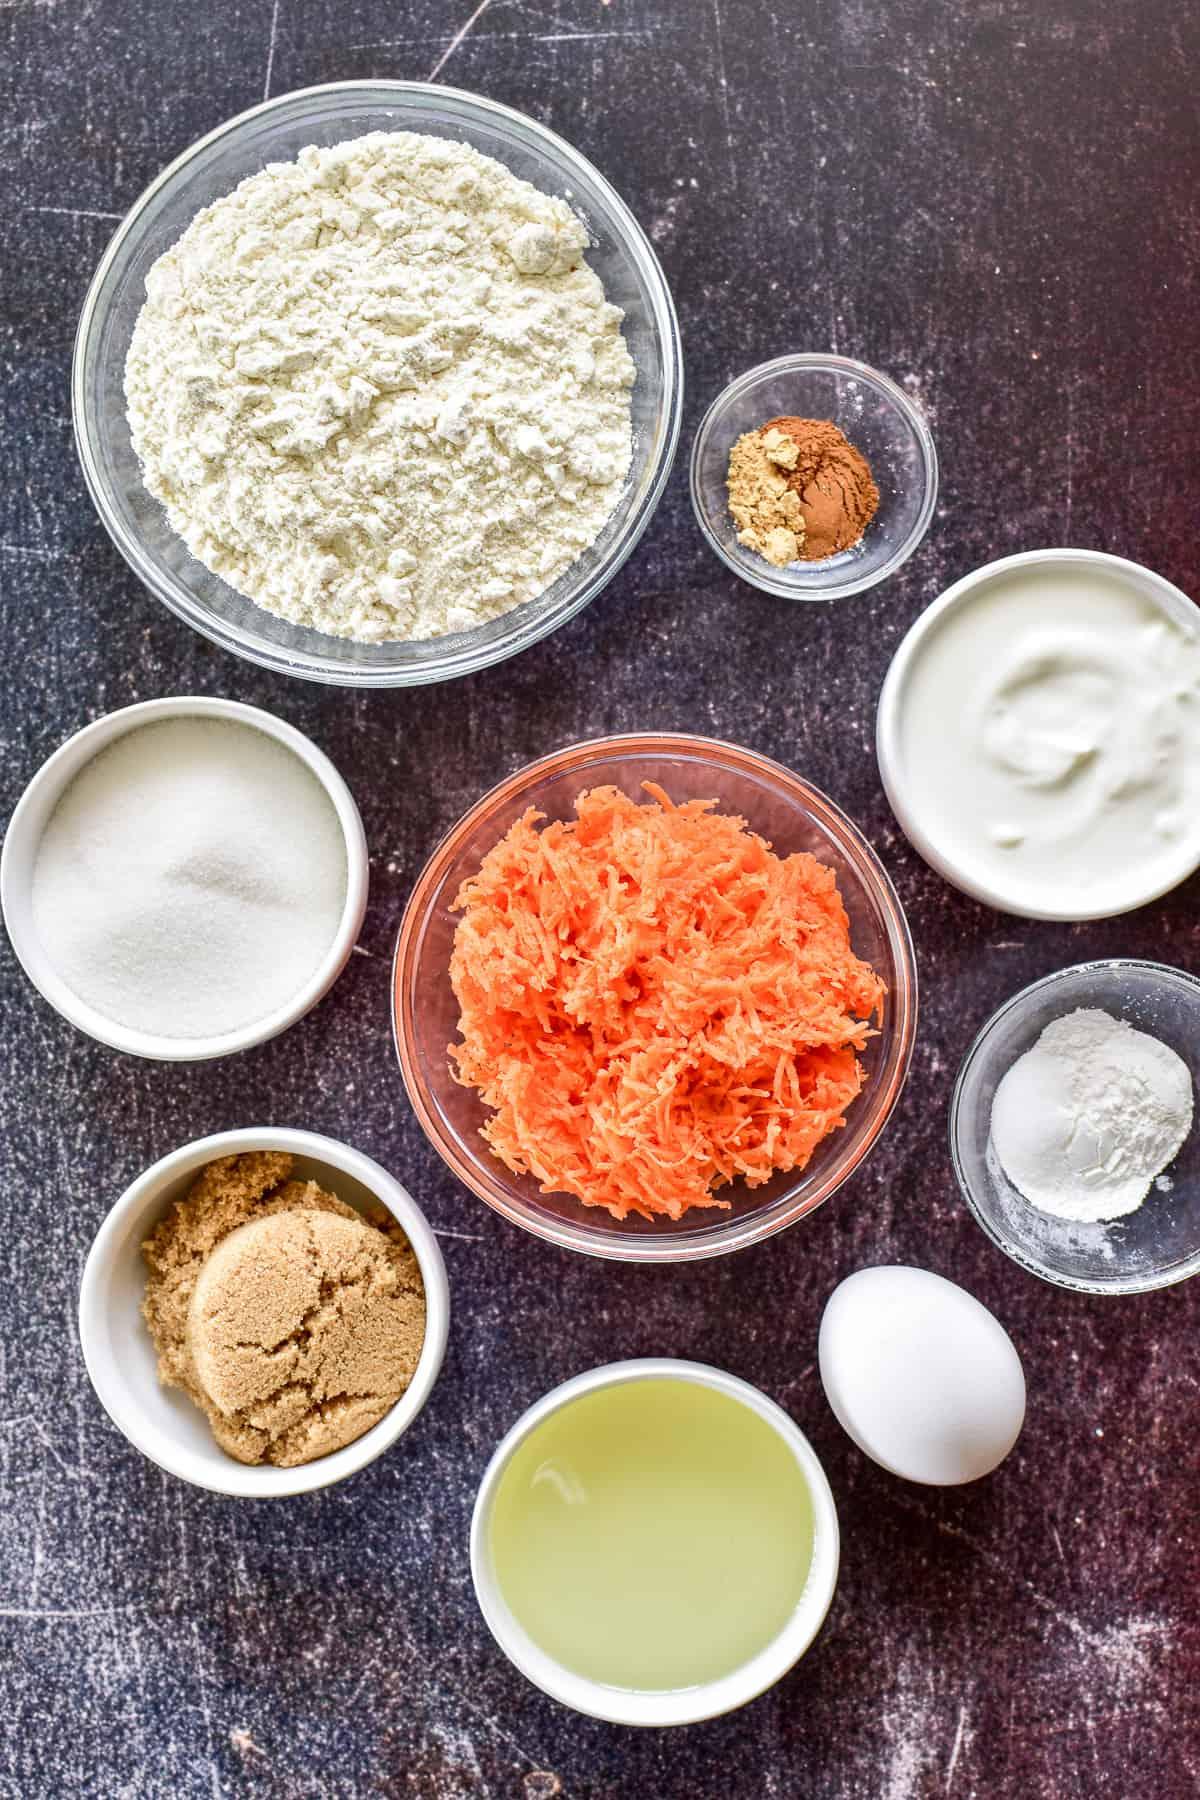 Overhead shot of ingredients in bowls